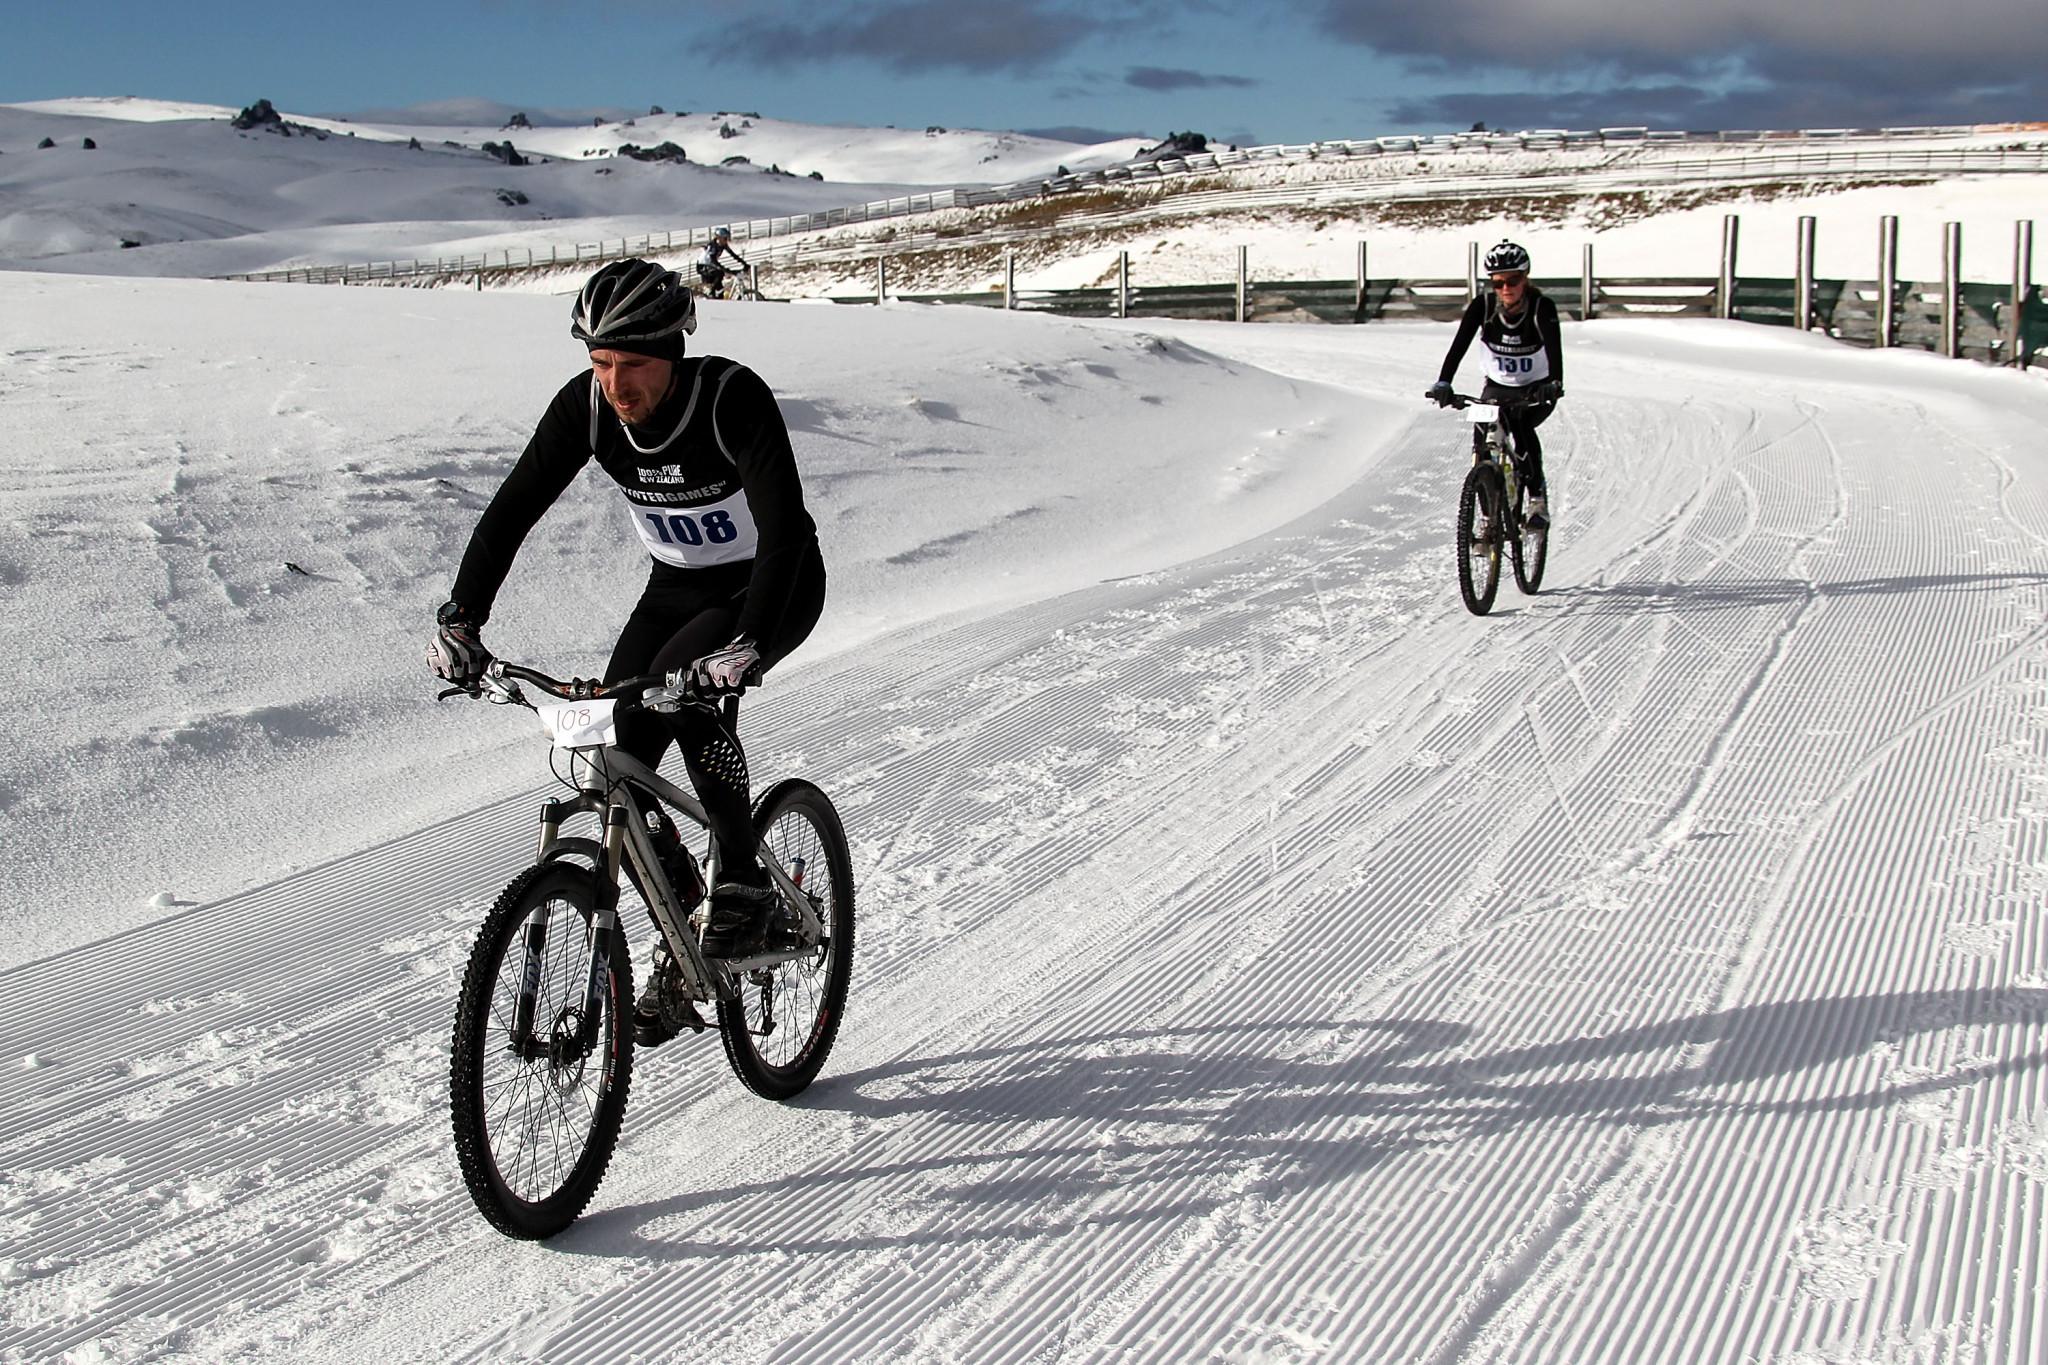 Winter triathlon involves running, bike and ski legs ©Getty Images